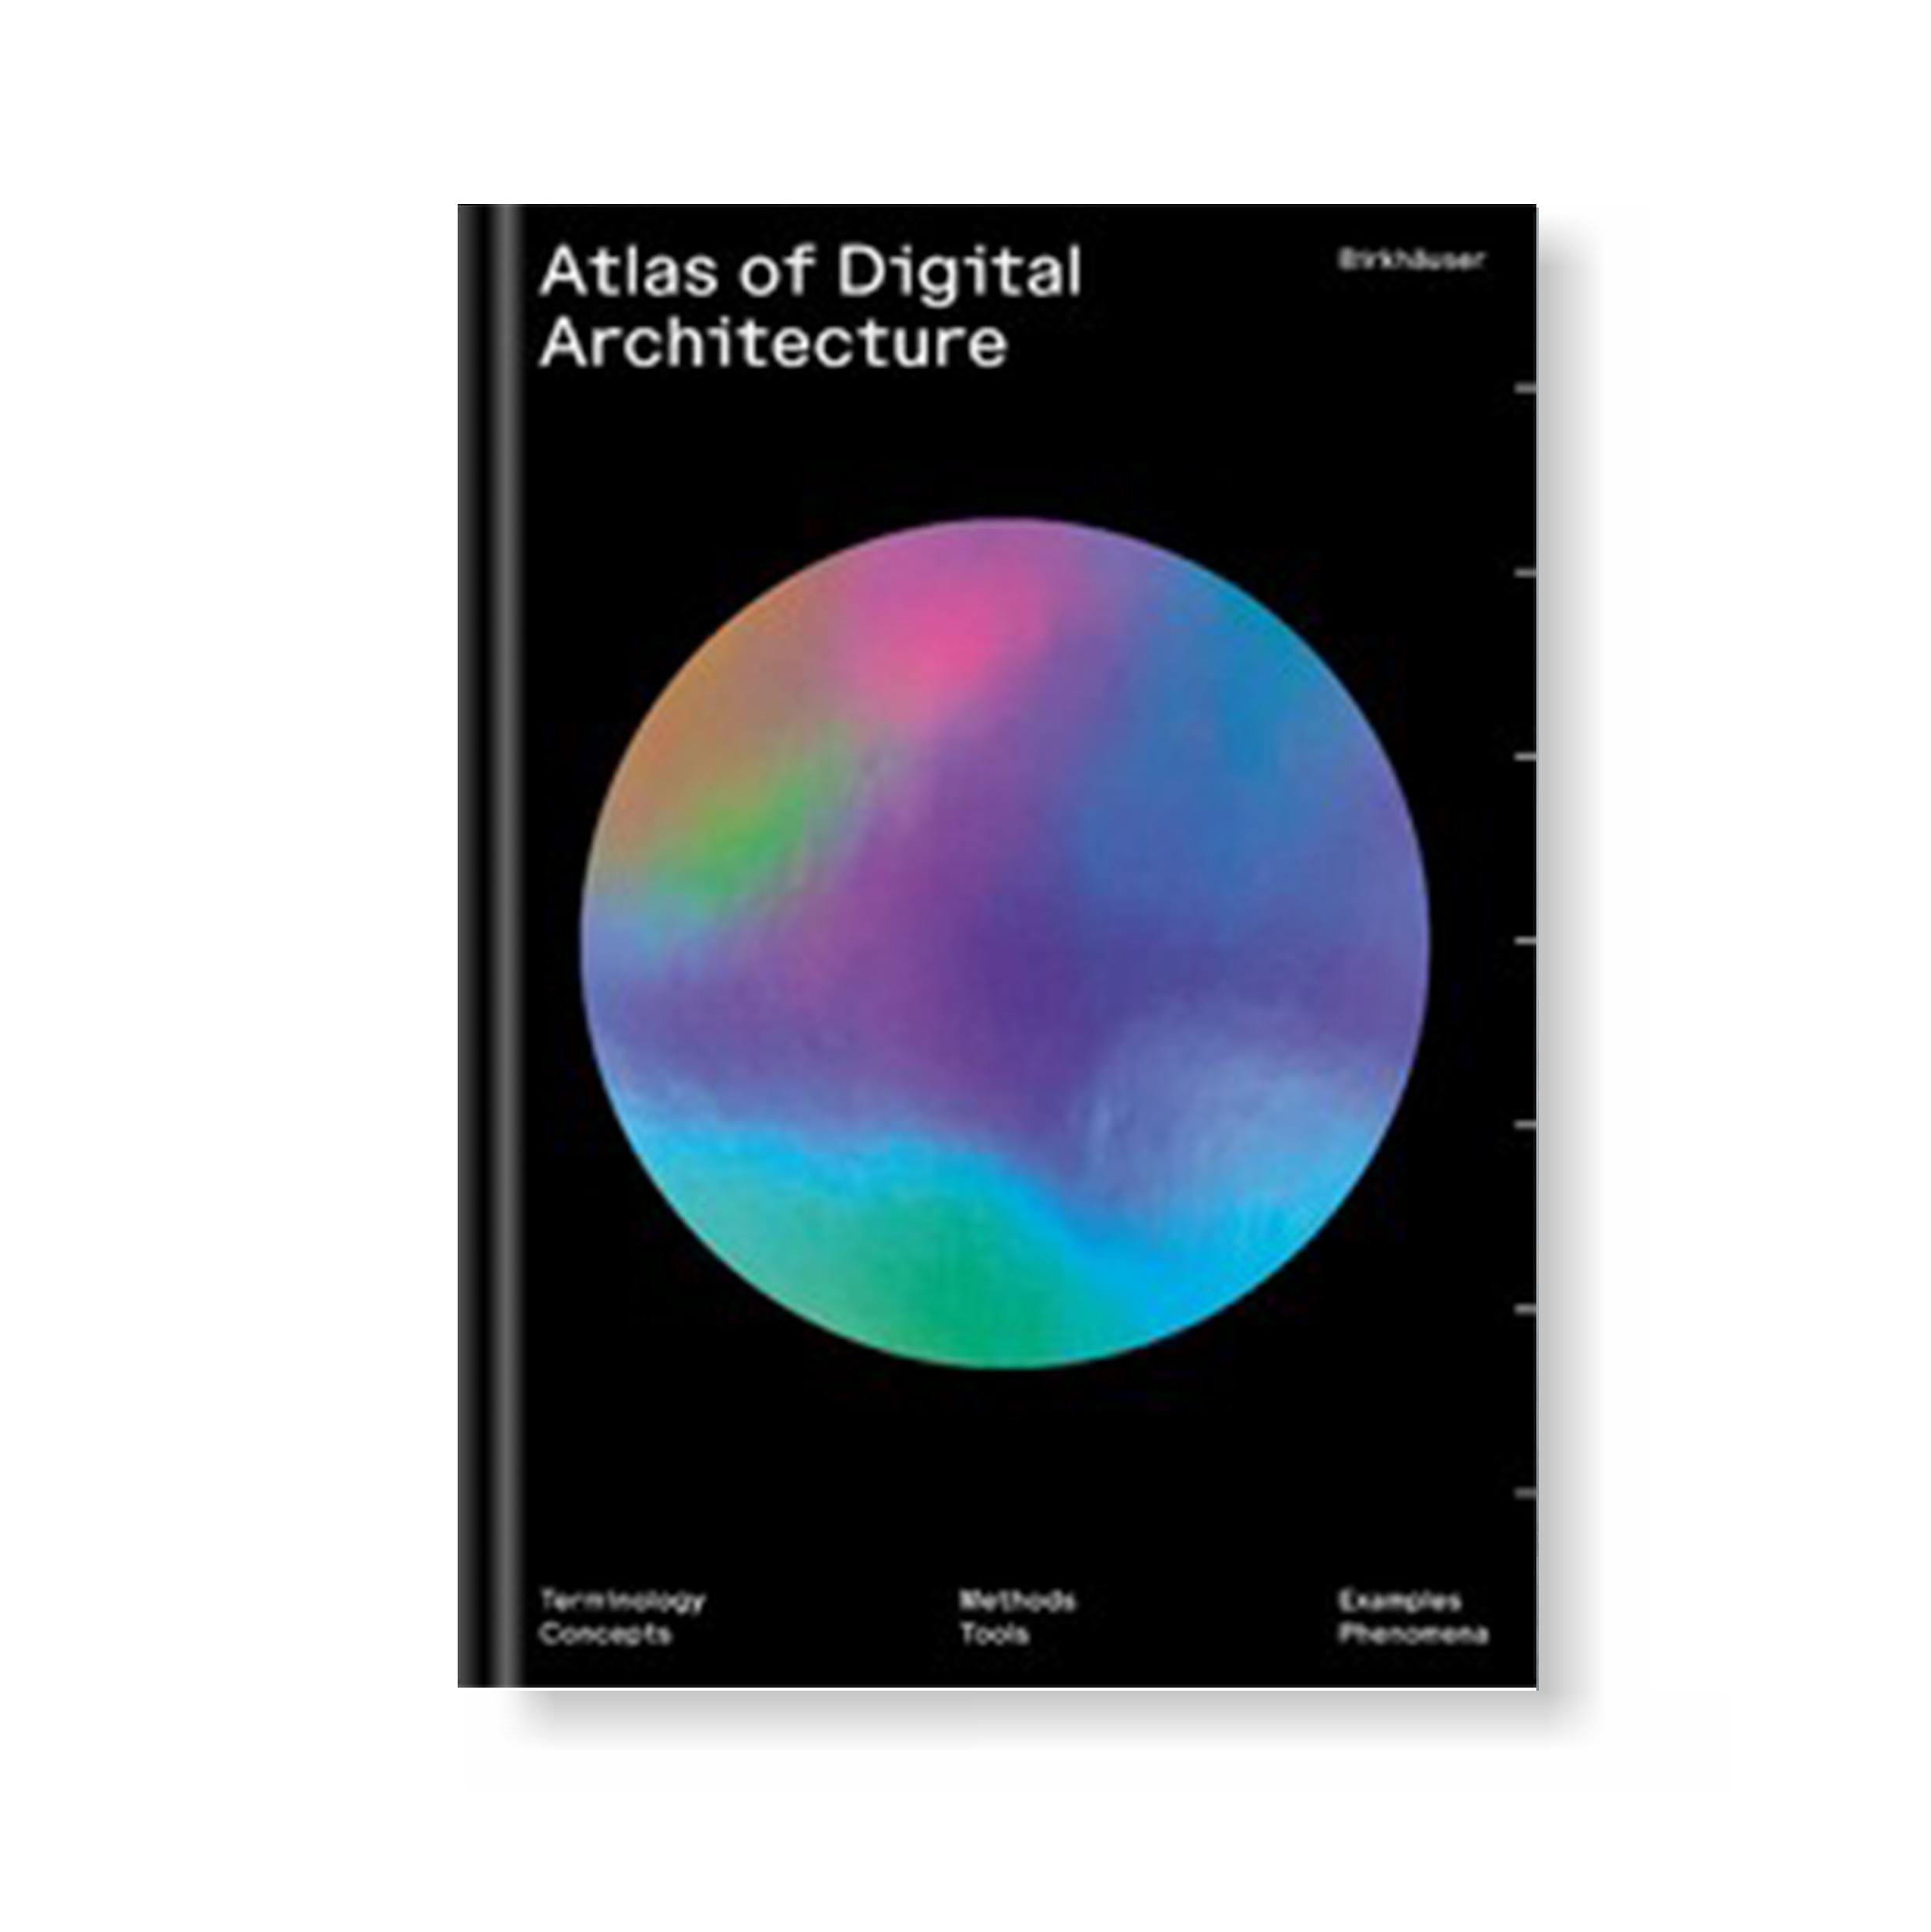 Atlas of Digital Architecture – Terminology, Concepts, Methods, Tools, Examples, Phenomena